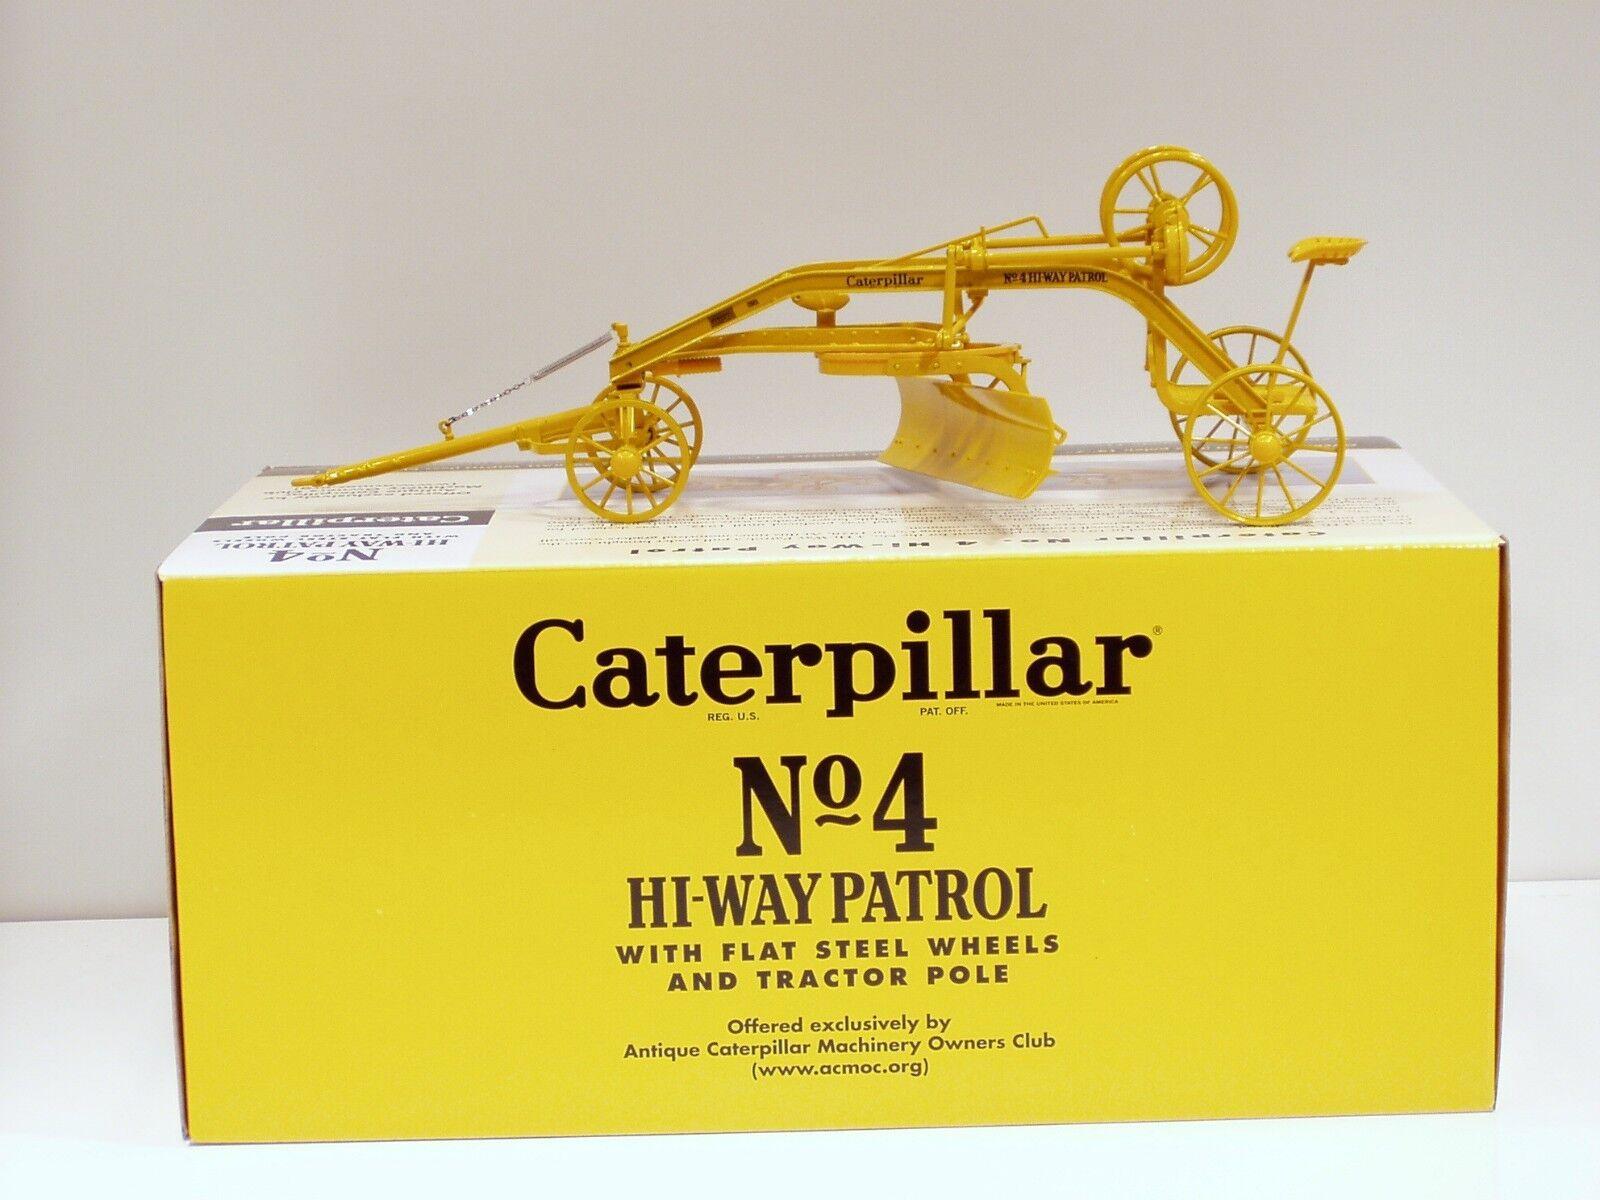 Caterpillar No.4 Hi-Way Patrol NIVELEUSE -  1 16 - Spec Cast   Cust 1105  préférentiel